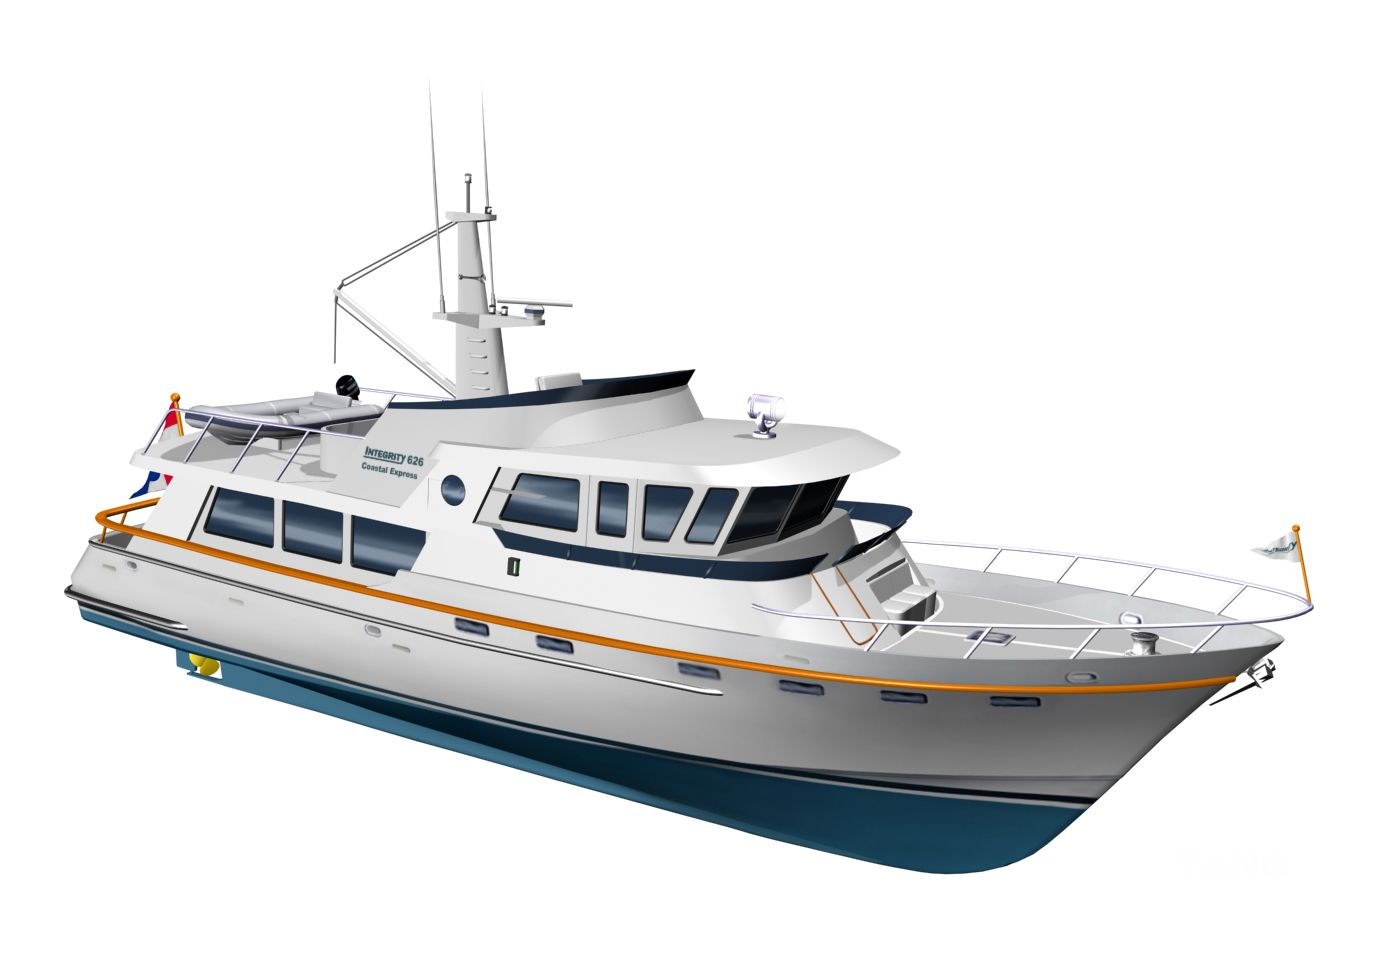 2018 Goldwater 65 CE Trawler Power Boat For Sale - www.yachtworld.com